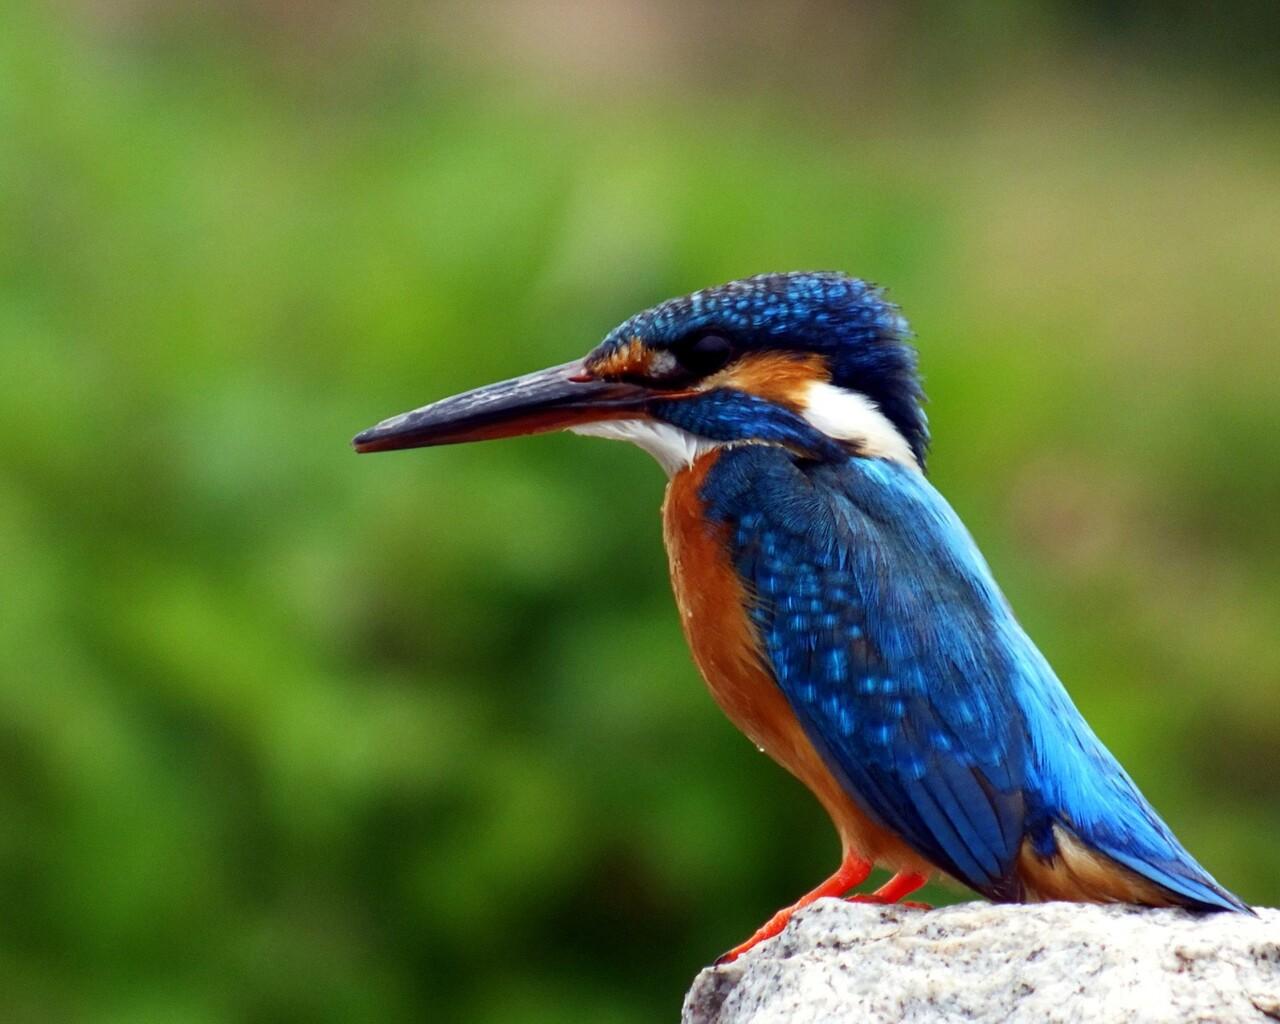 kingfisher-bird.jpg